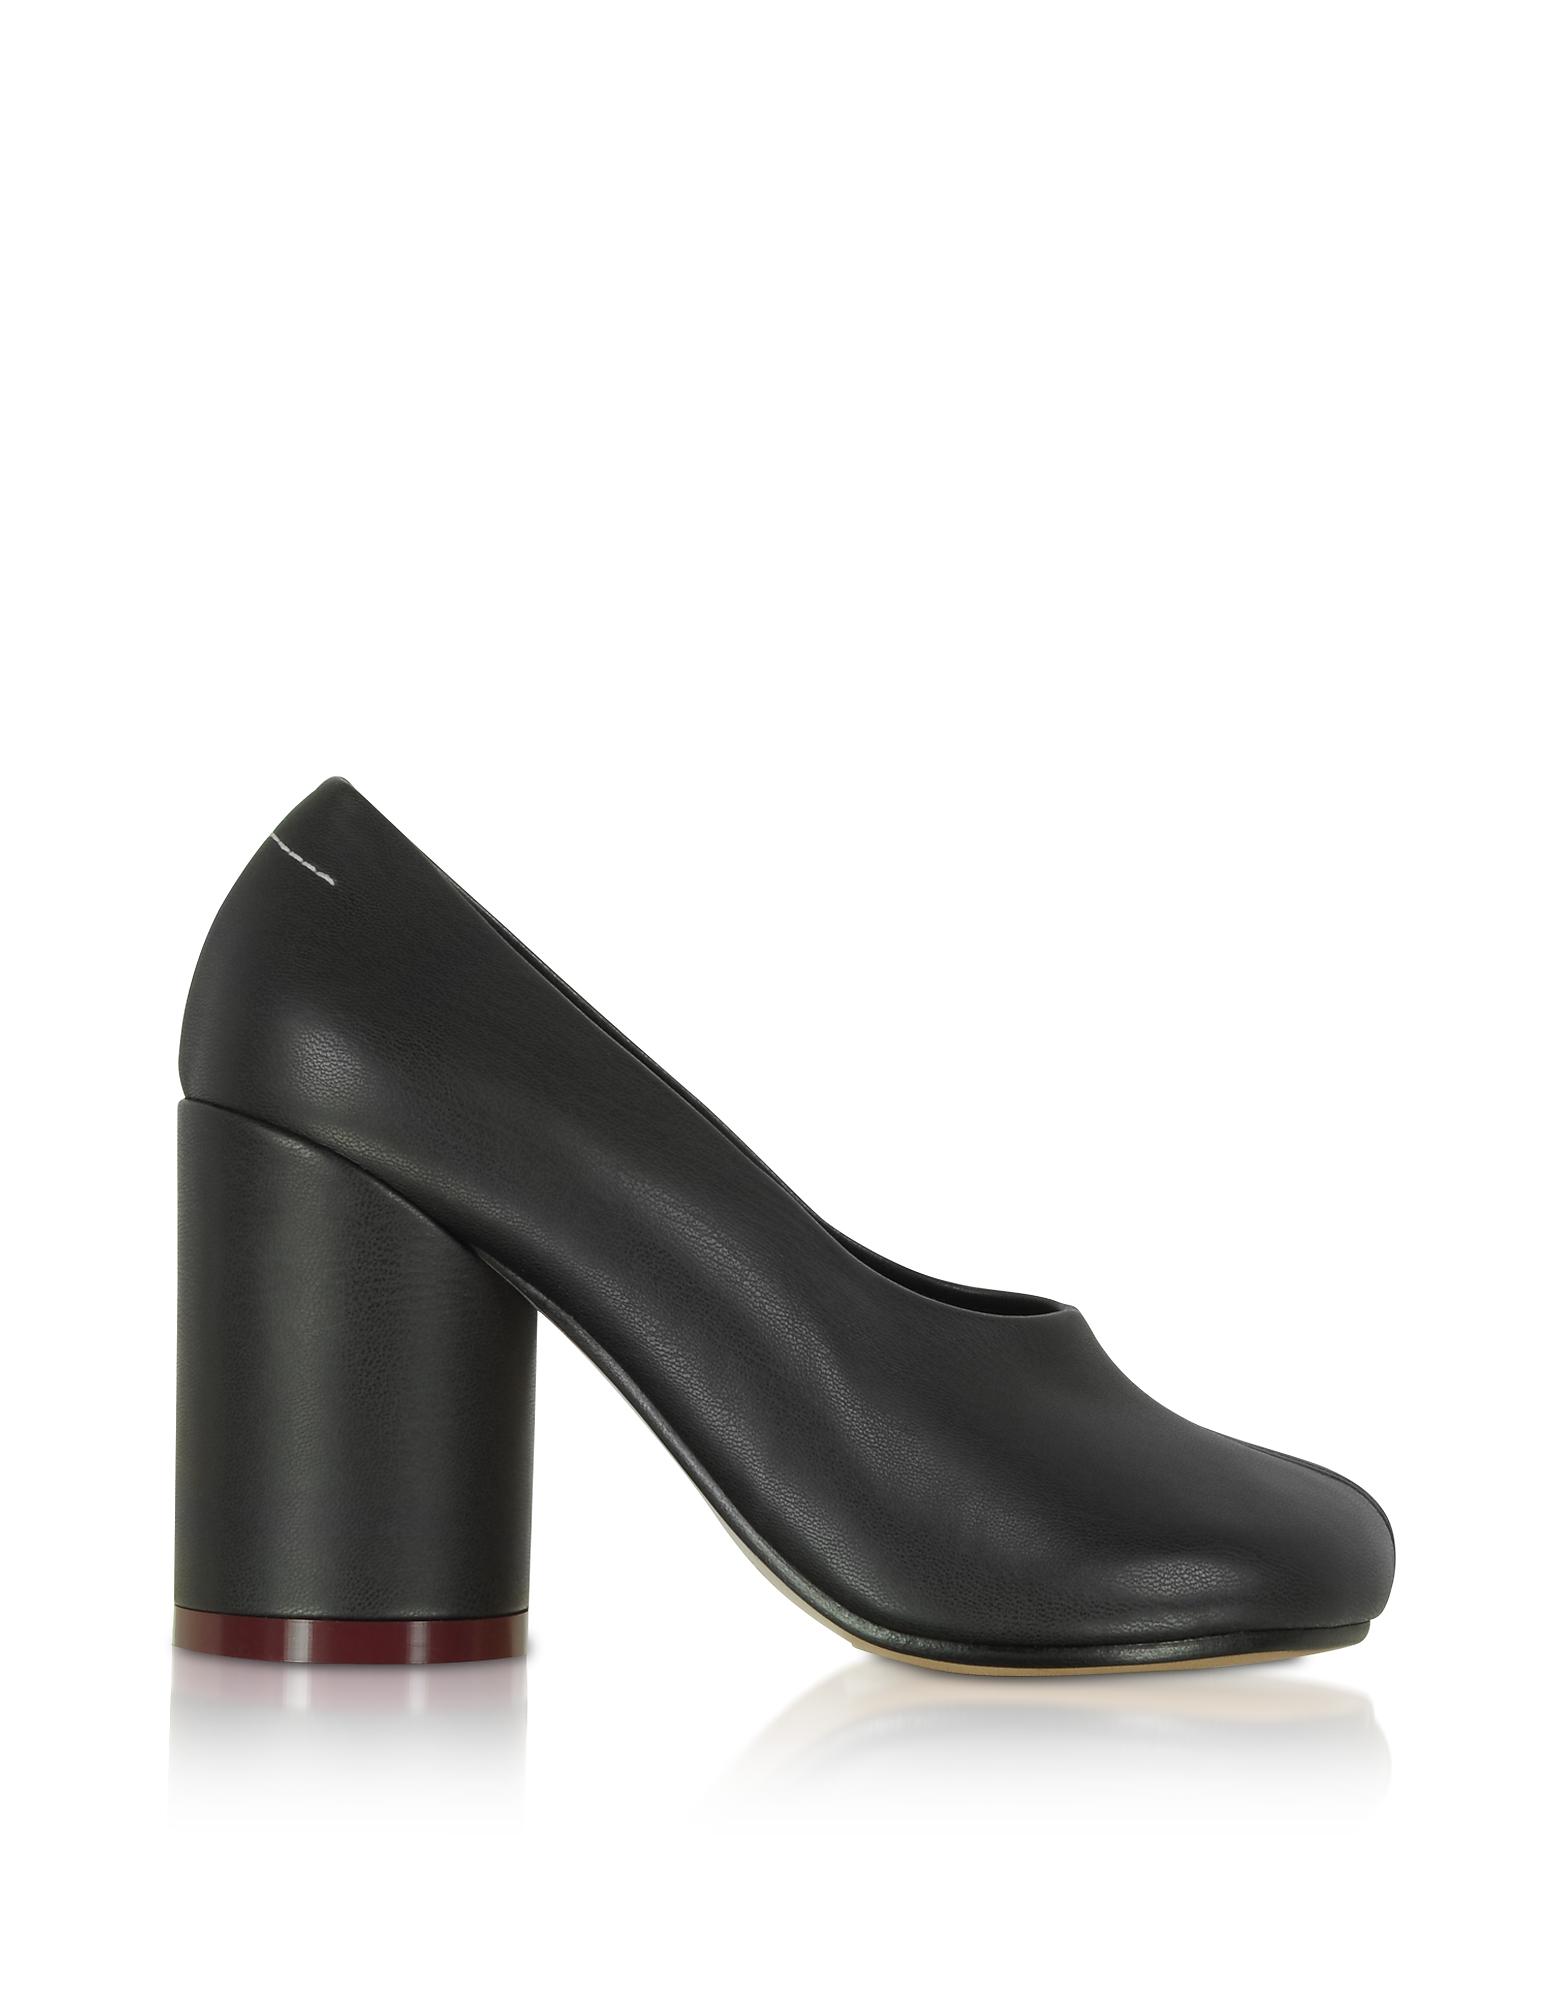 MM6 Maison Martin Margiela Designer Shoes, Black Leather Pumps